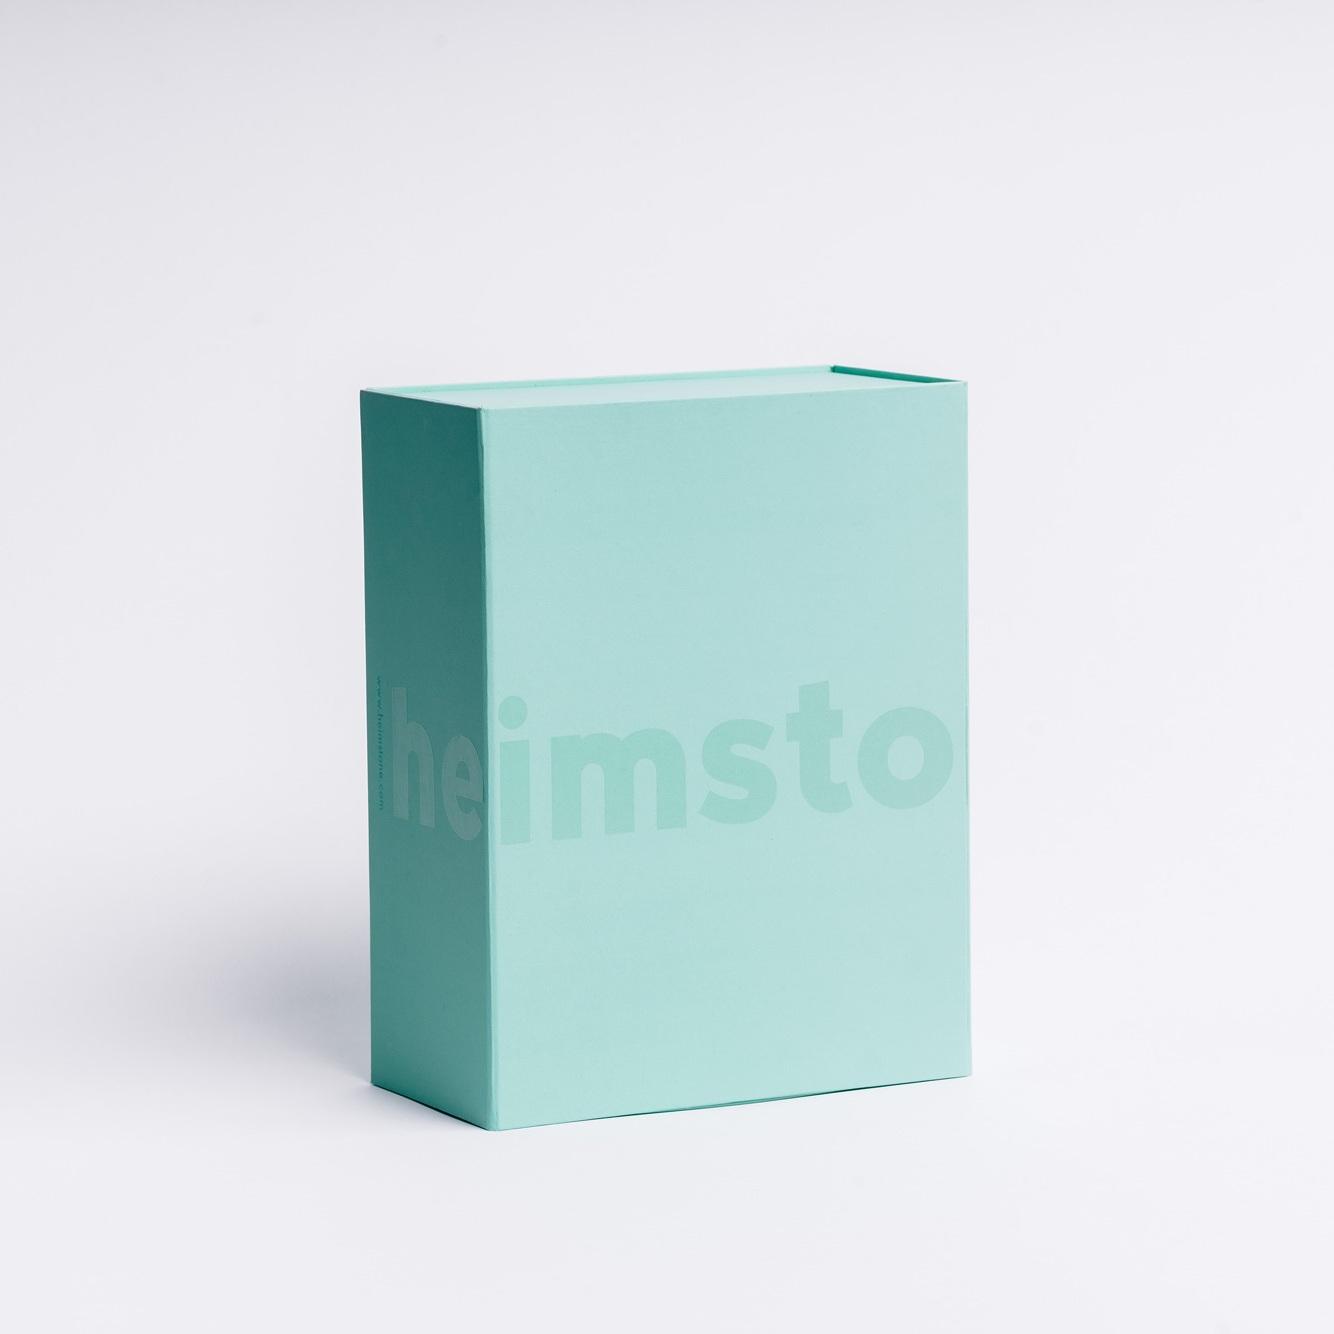 heimstone-show-box-detail-3.jpg